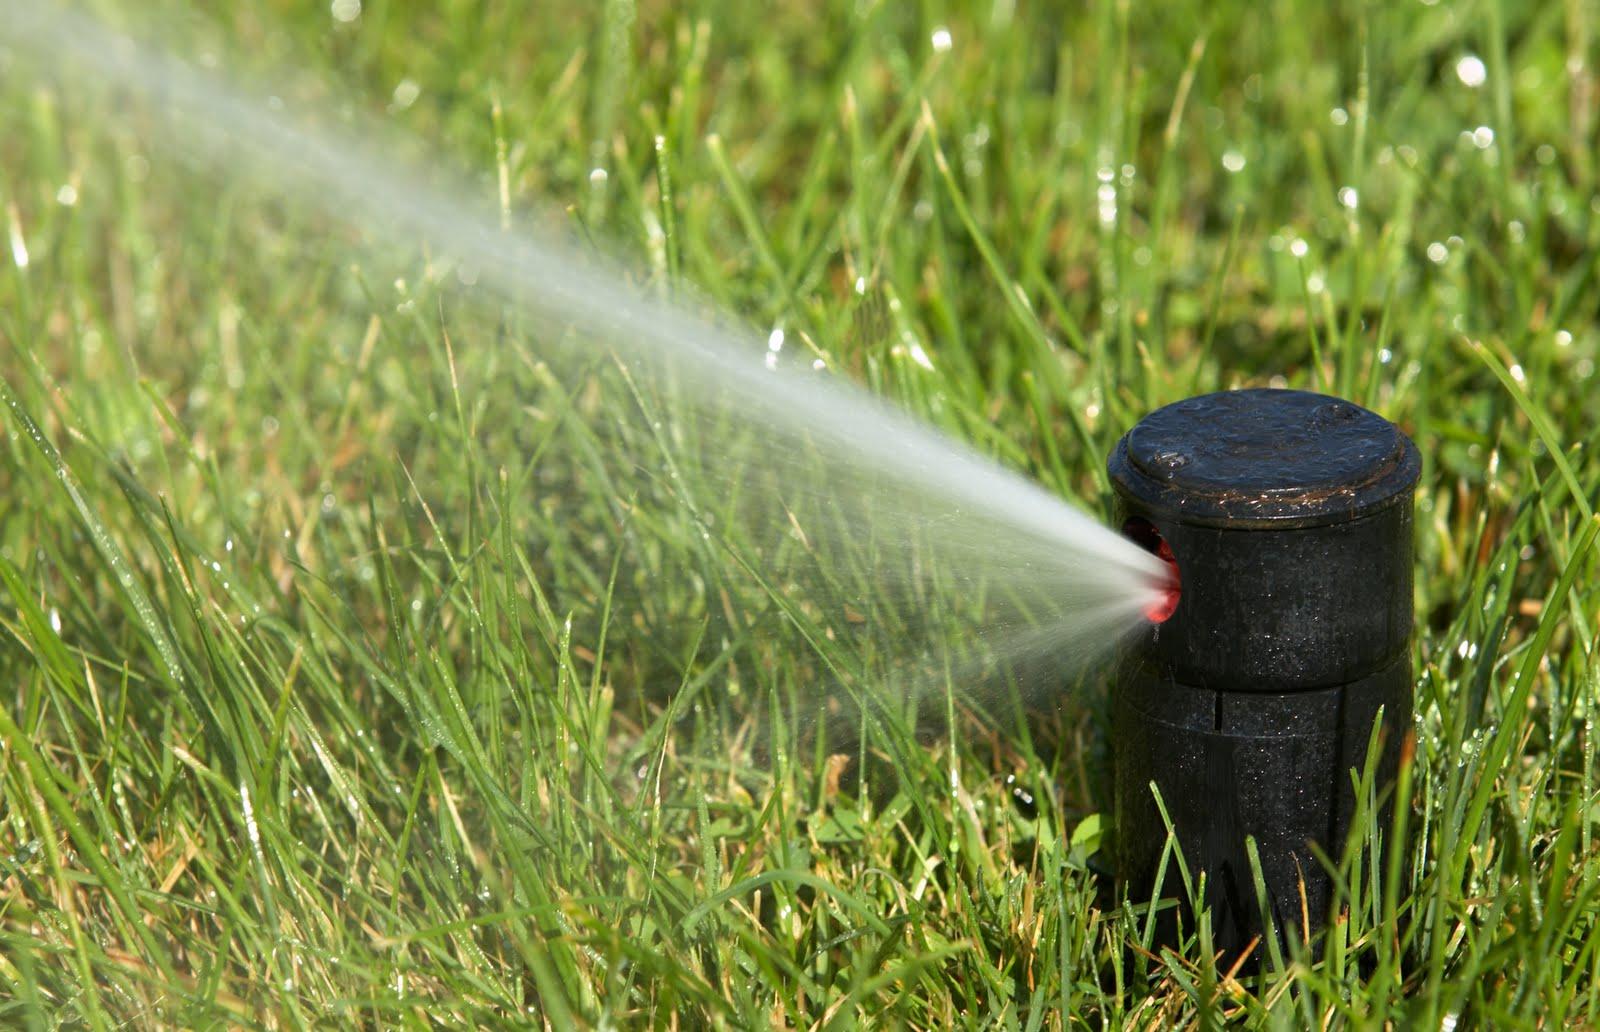 central oklahoma lawn sprinkler experts french drains sprinkler